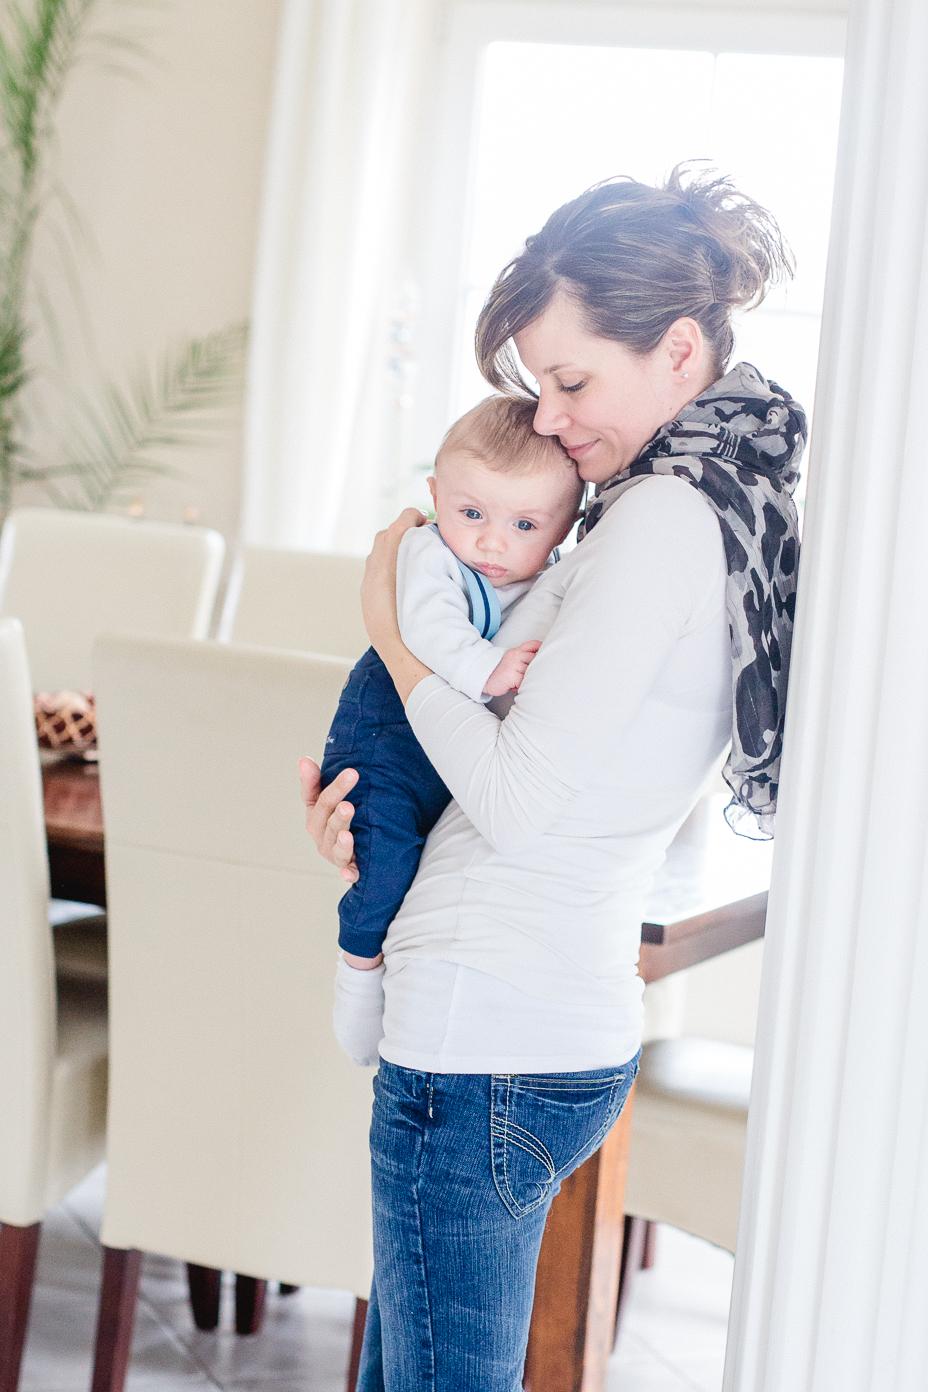 Babyfotografie-Kassel-2015-Inka Englisch Fotografie-Babyportraits-Babyshooting-Homestory-NS_015